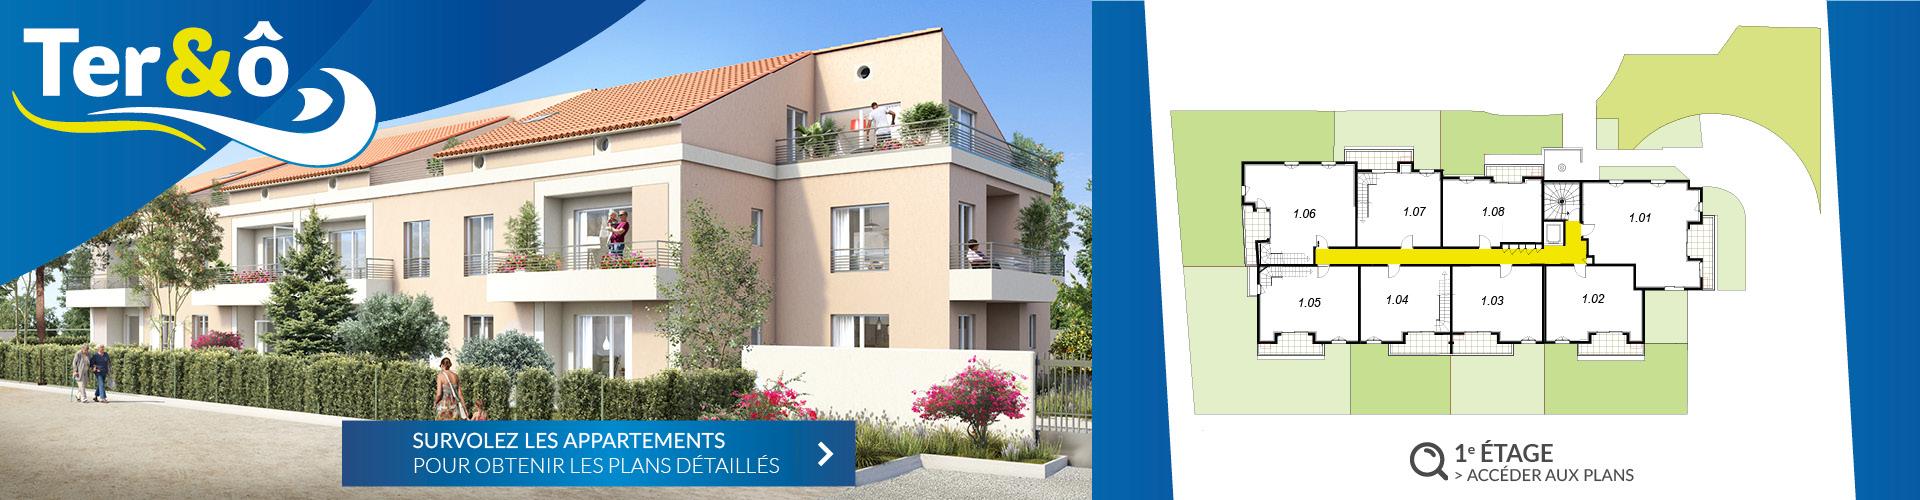 1er étage - Résidence immobilière Ter&O - La Garde - Var - 83